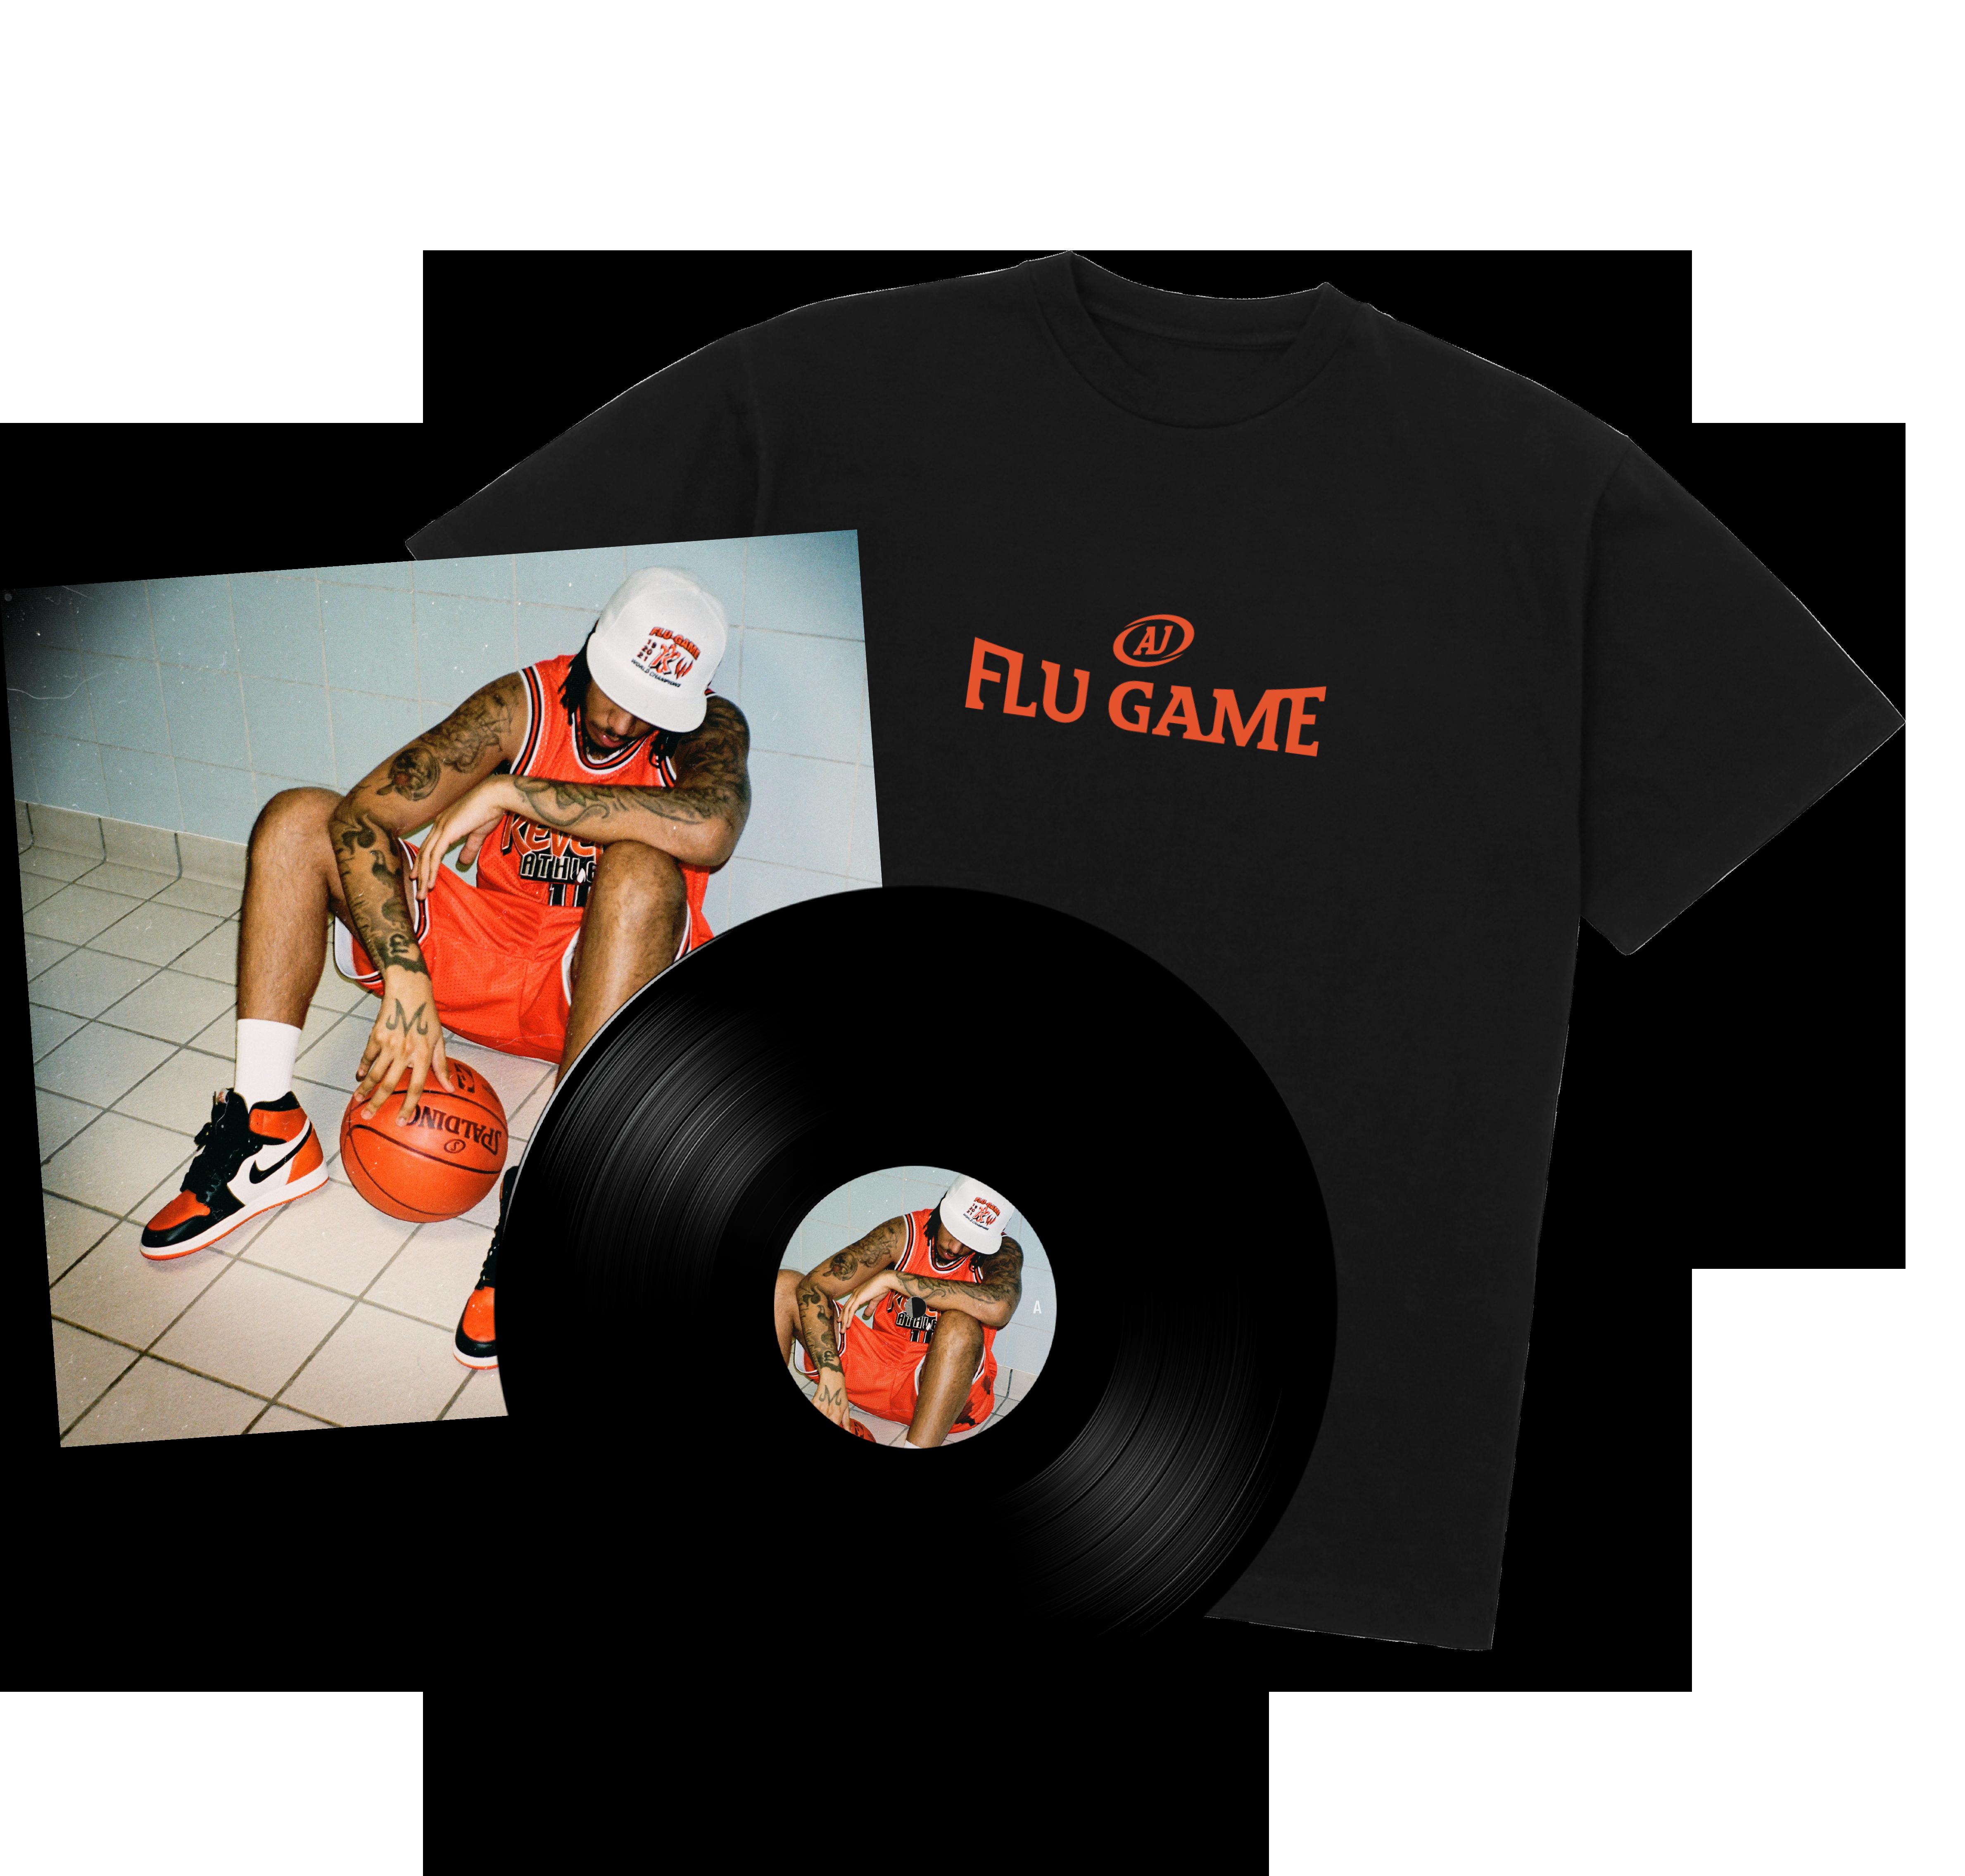 Flu Game LP + T-Shirt Bundle - Black